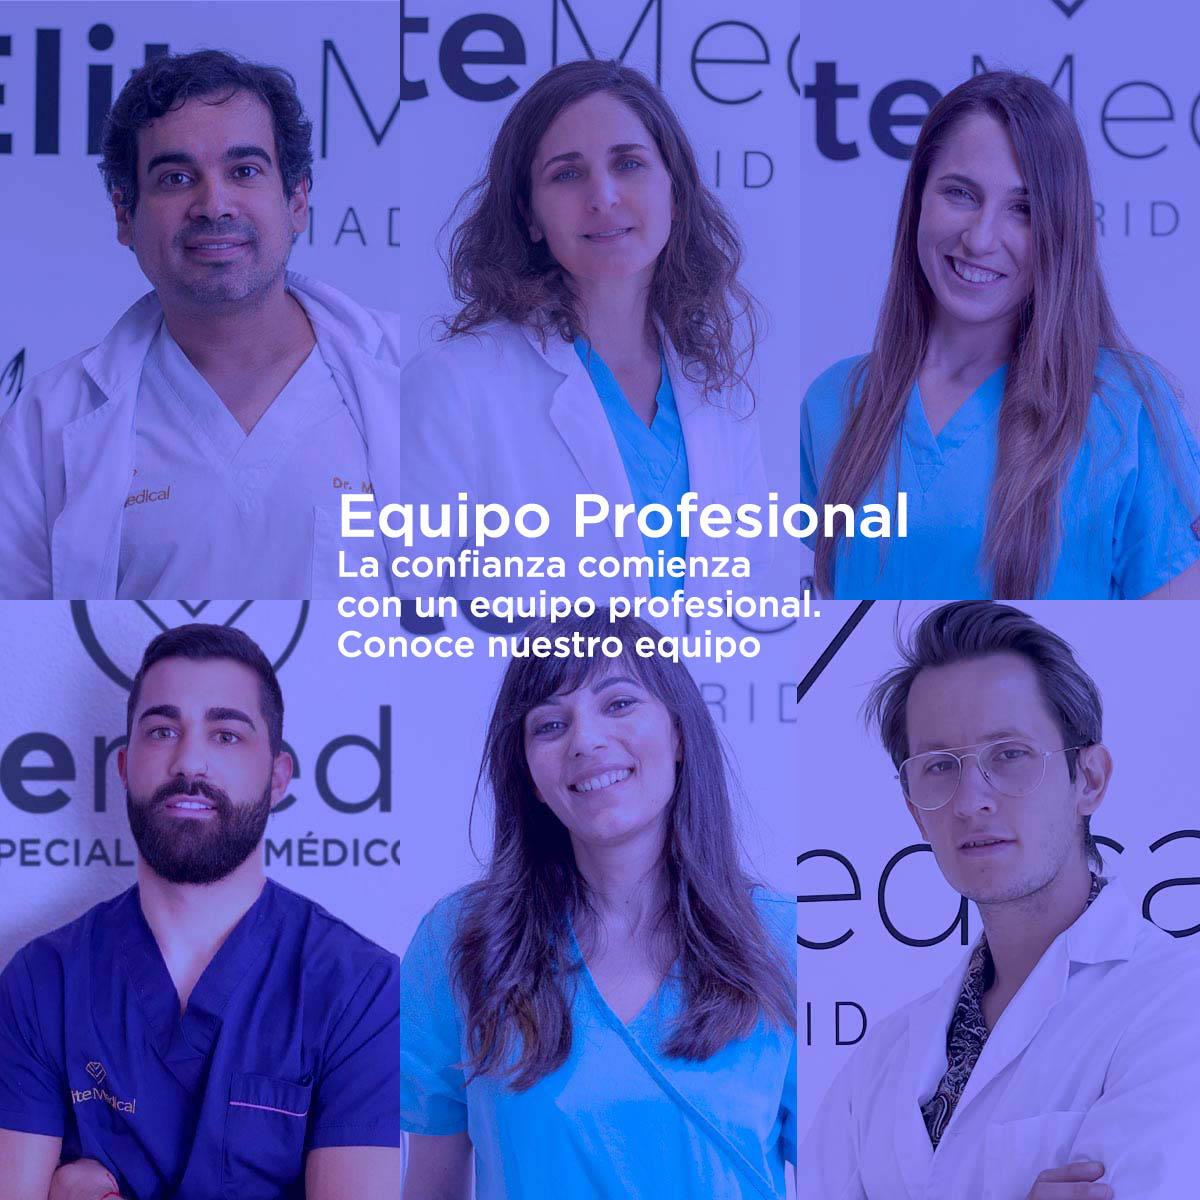 Equipo Profesional en Élite Medical Madrid